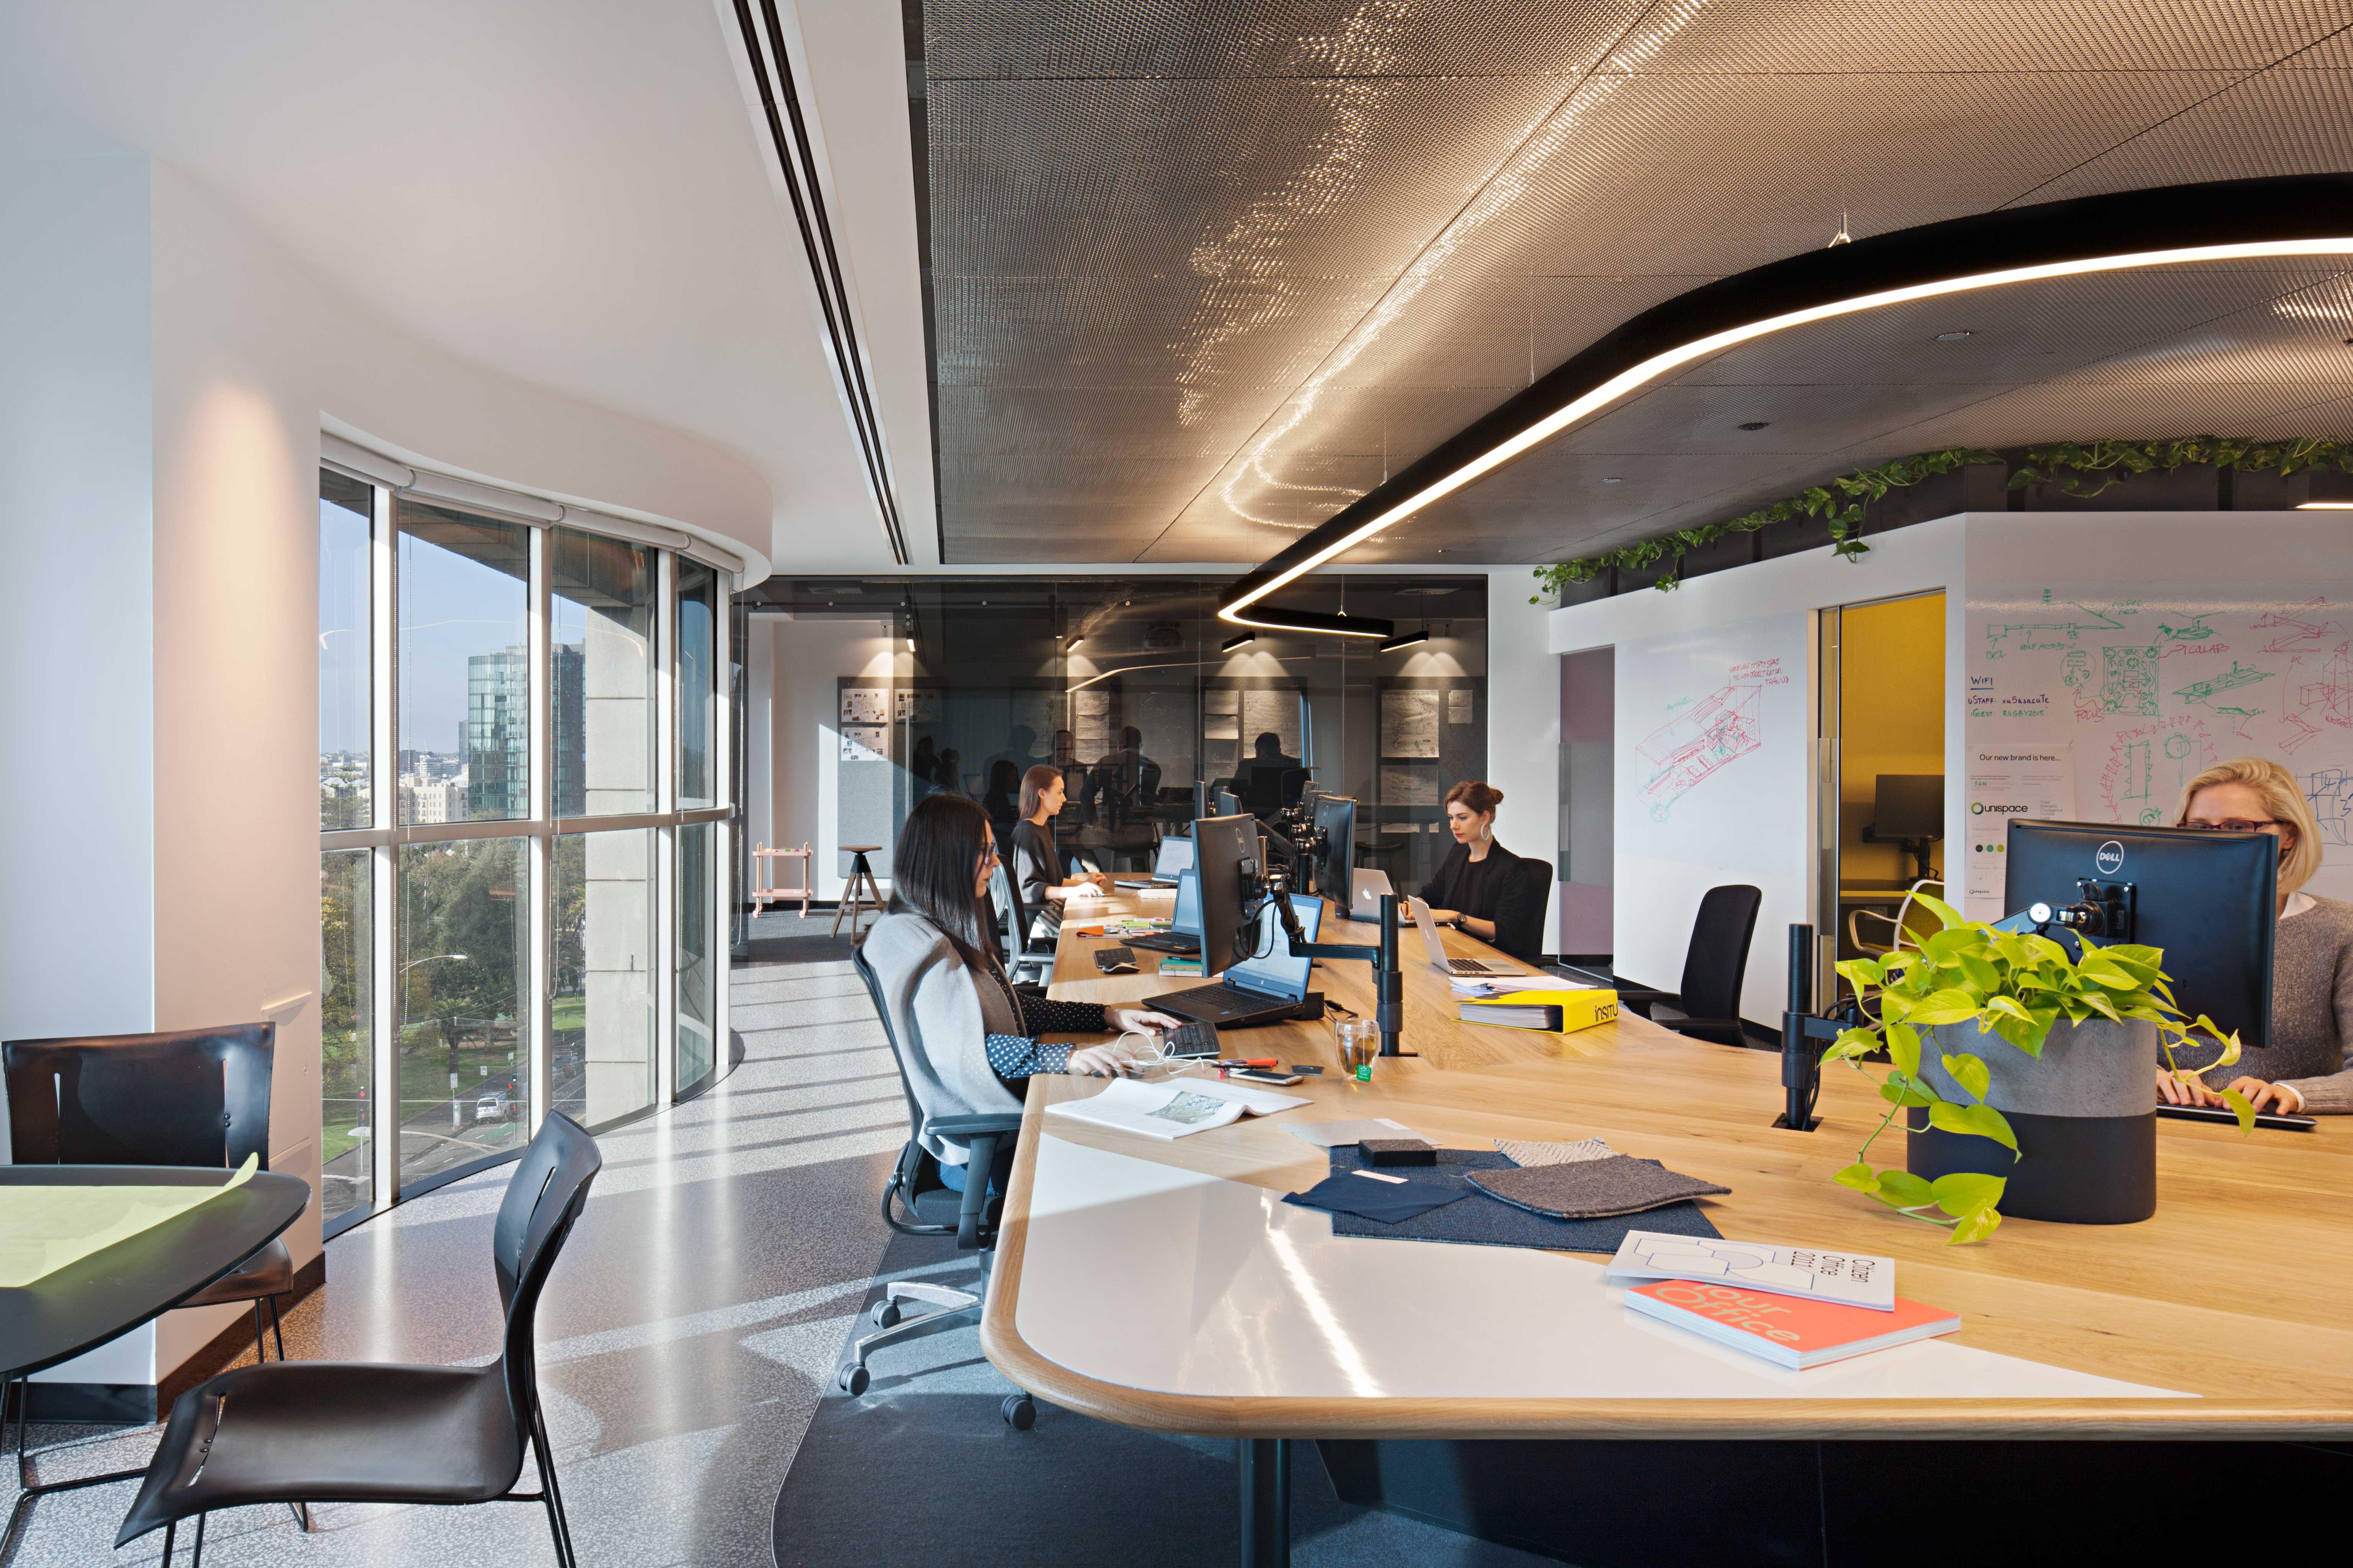 office interiors melbourne. Office Interiors Melbourne. Melbourne Y